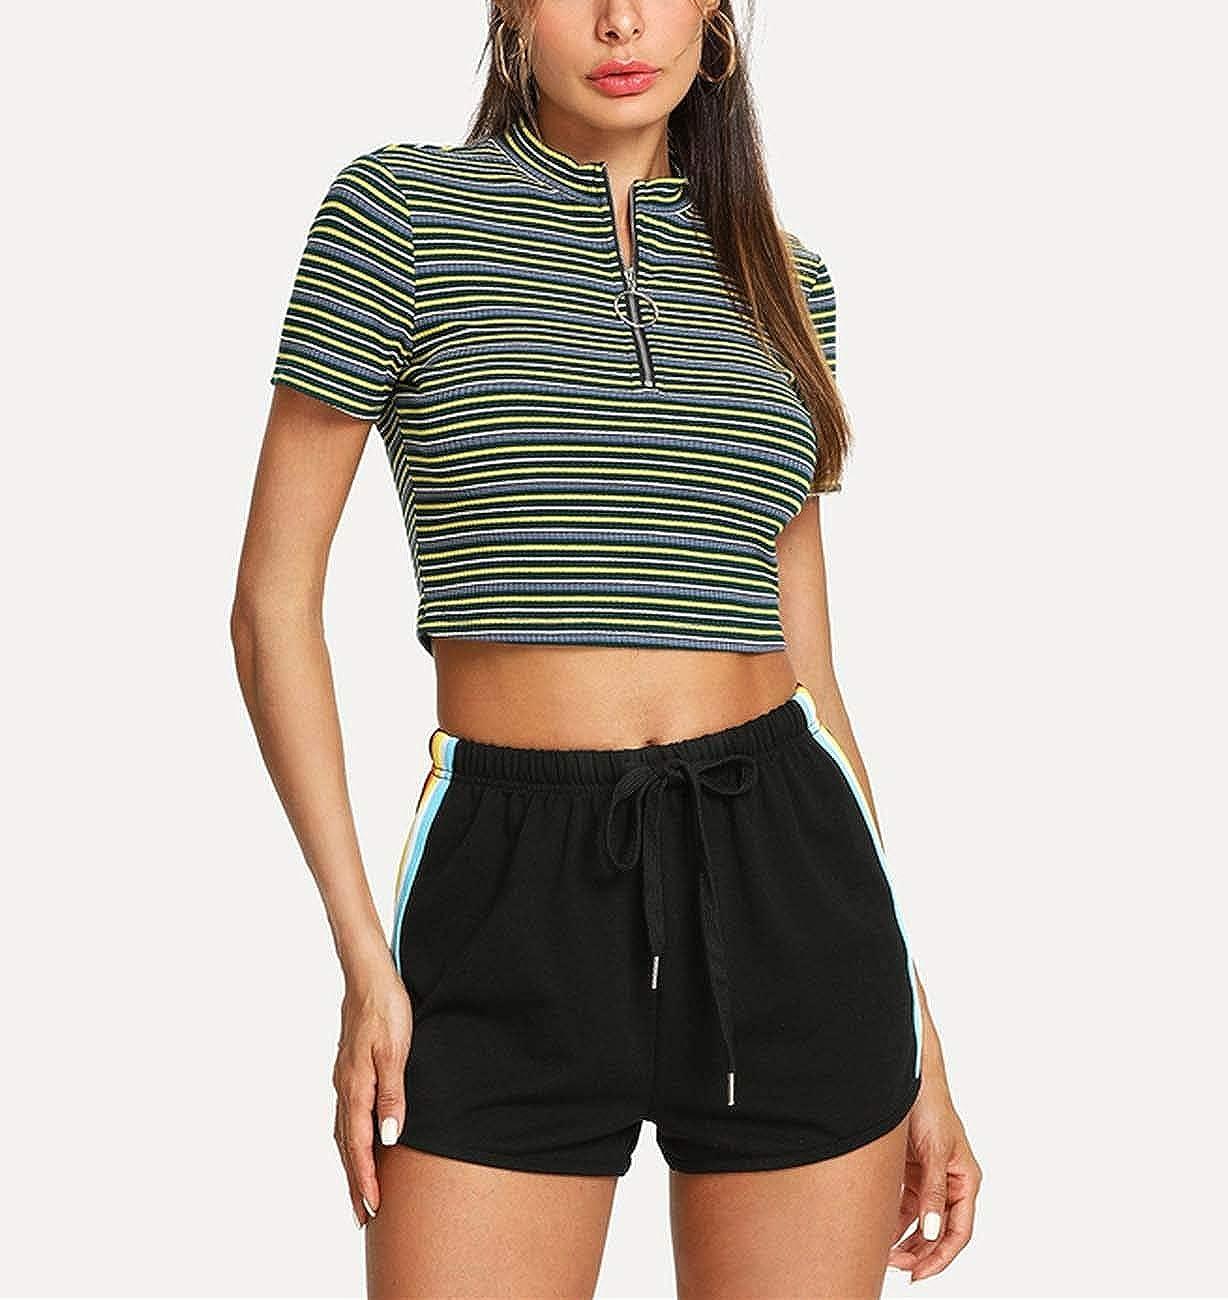 huayun Striped Side Drawstring Shorts Summer Shorts Women Black Mid Waist Sporting Shorts